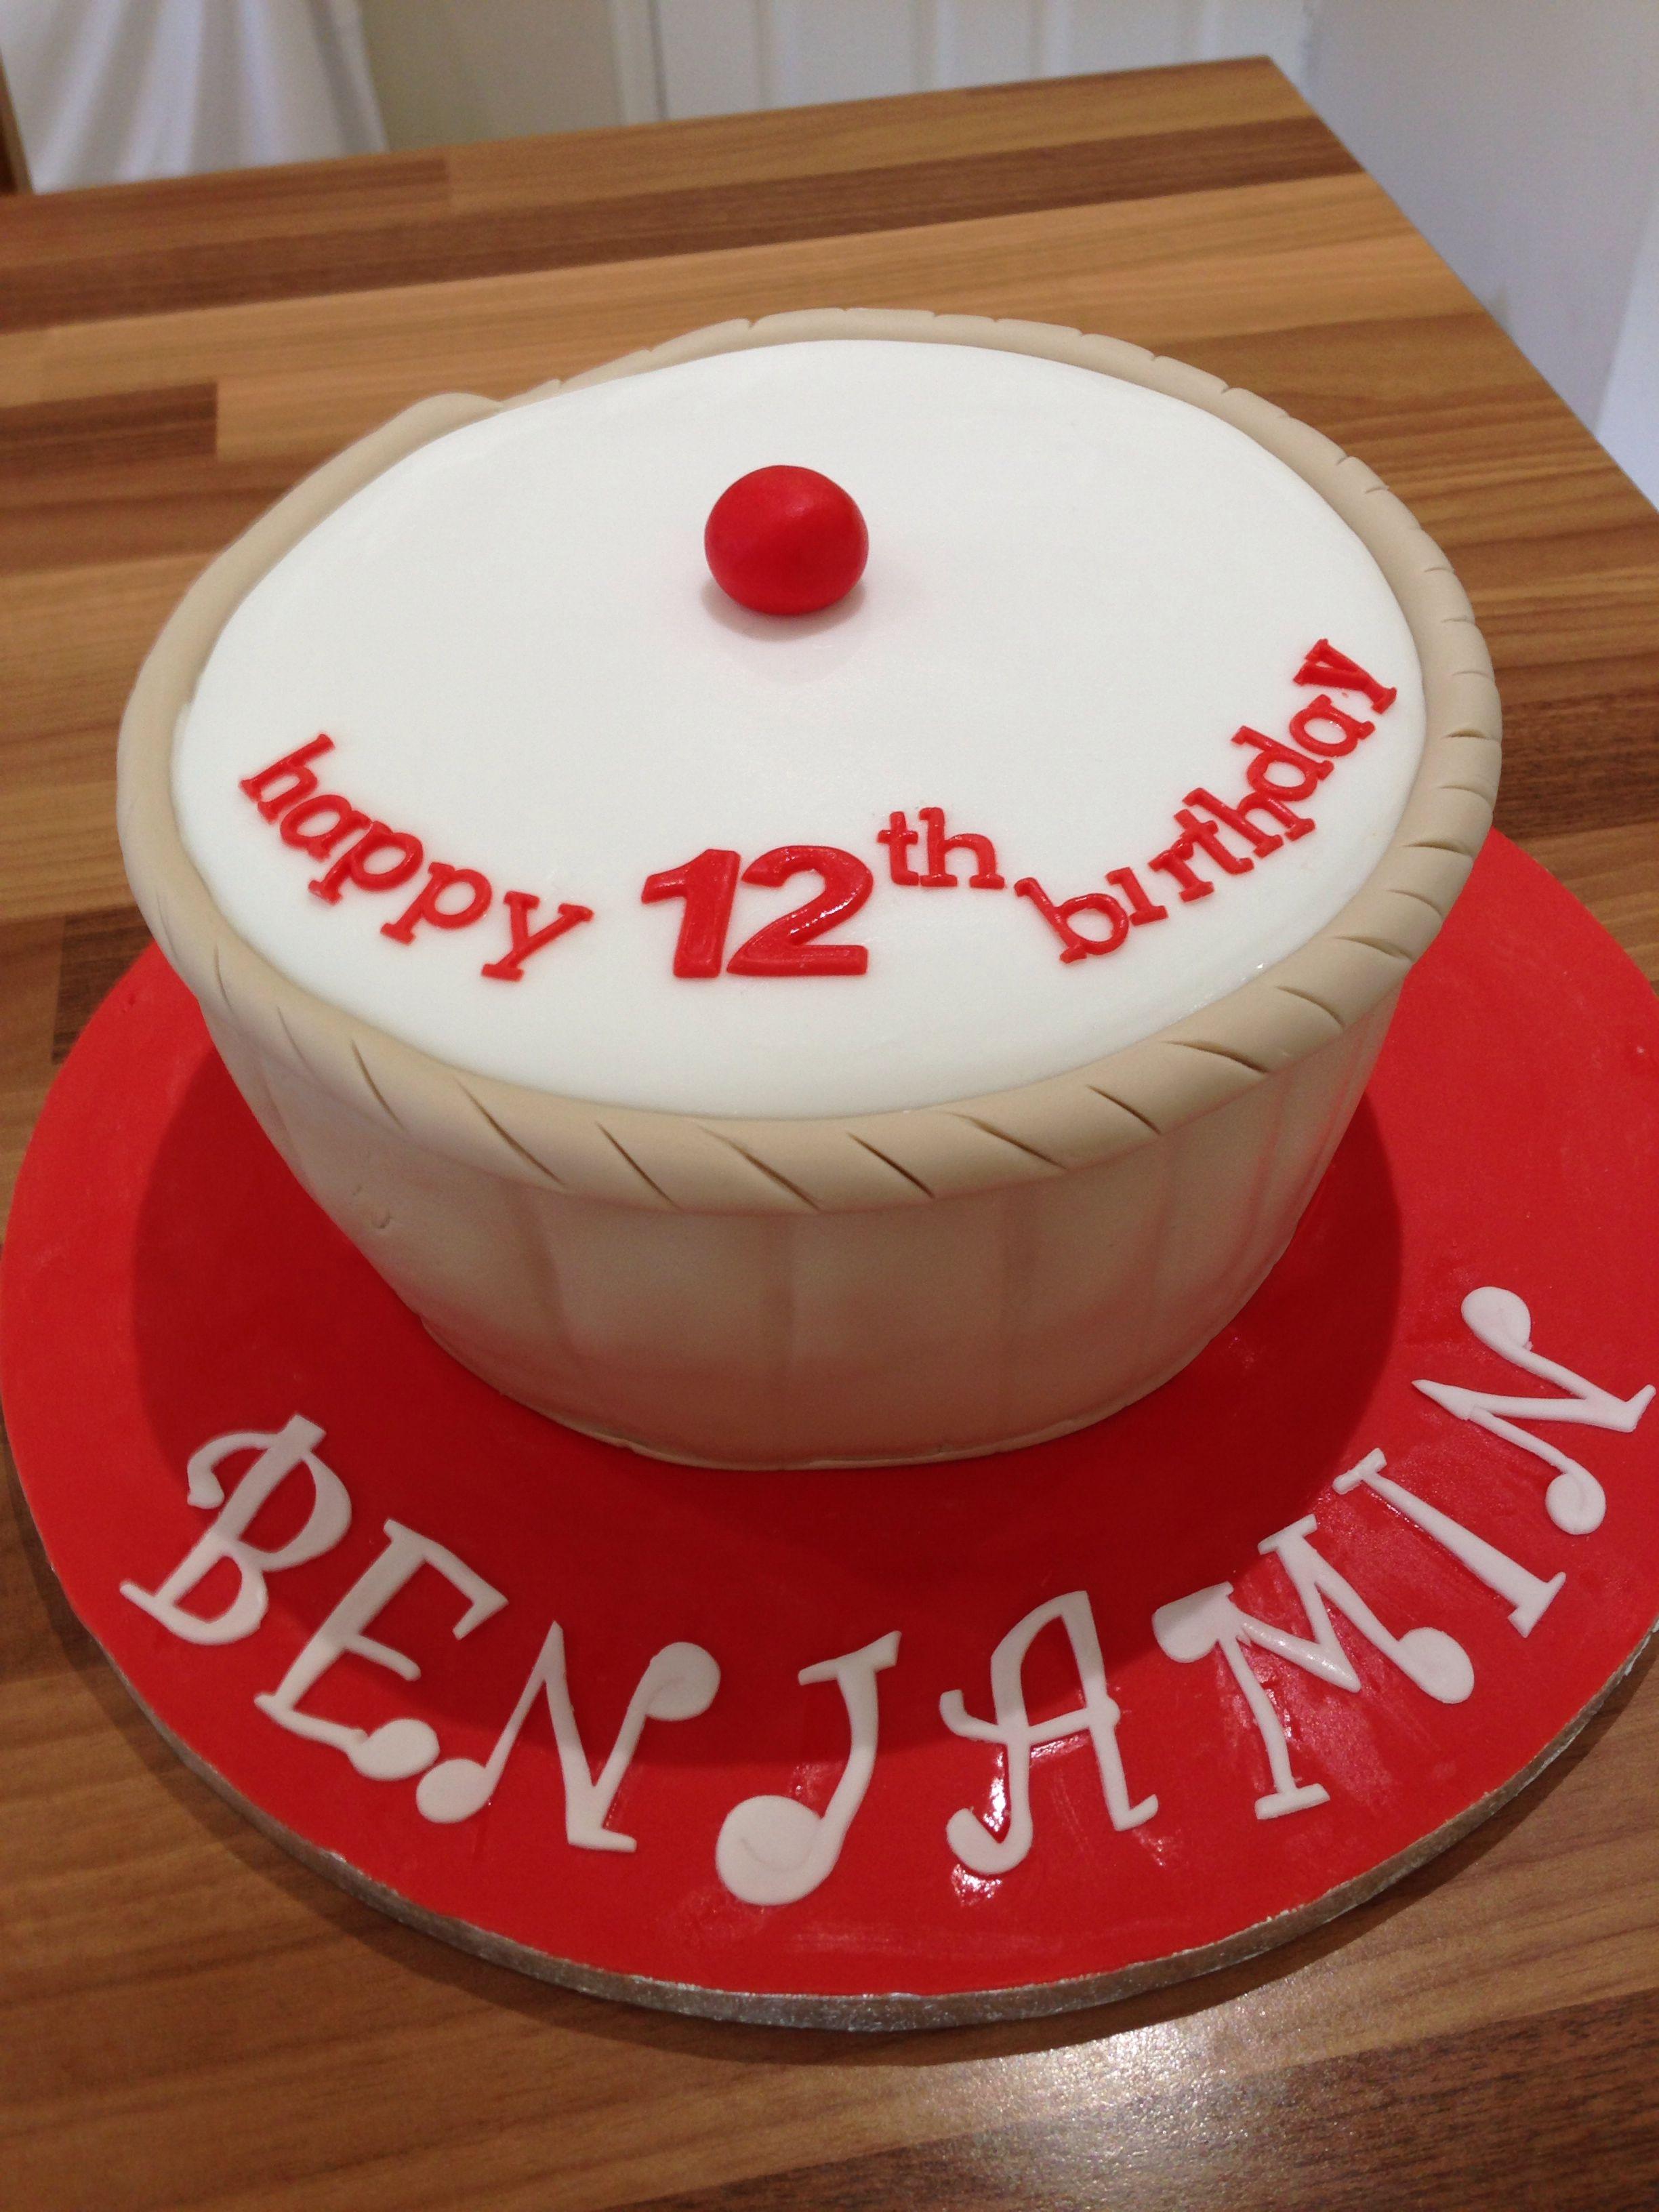 Awe Inspiring Giant Cherry Bakewell Cake Cake Cherry Bakewell Cake Bakewell Cake Personalised Birthday Cards Sponlily Jamesorg